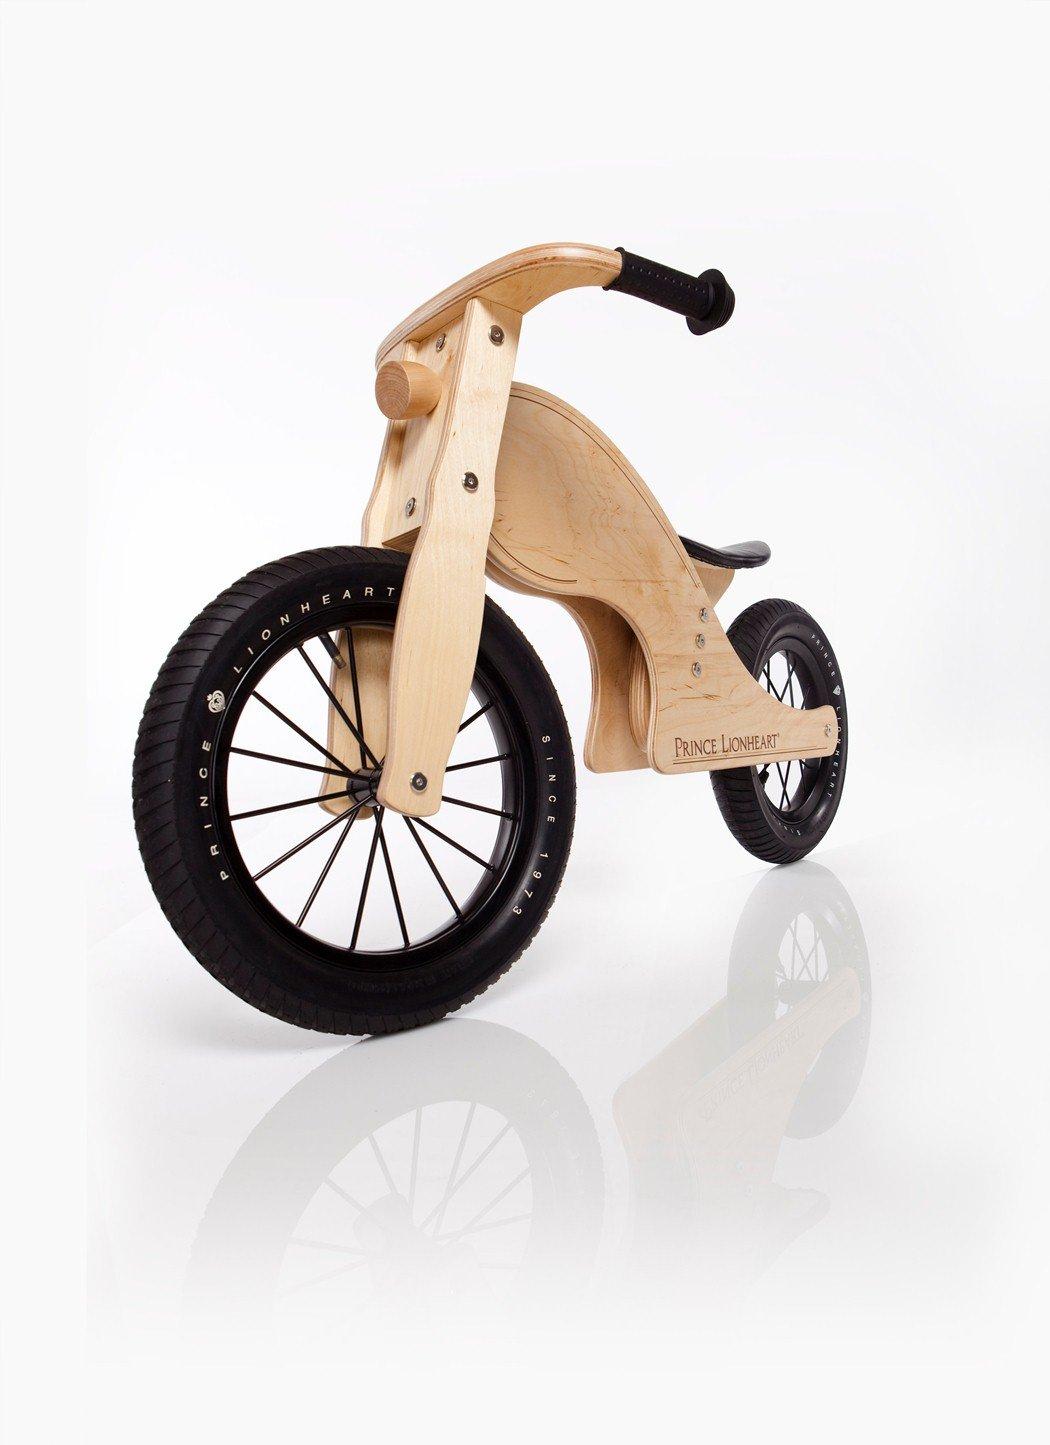 Prince Lionheart Chop Balance Bike, Natural by Prince Lionheart (Image #1)